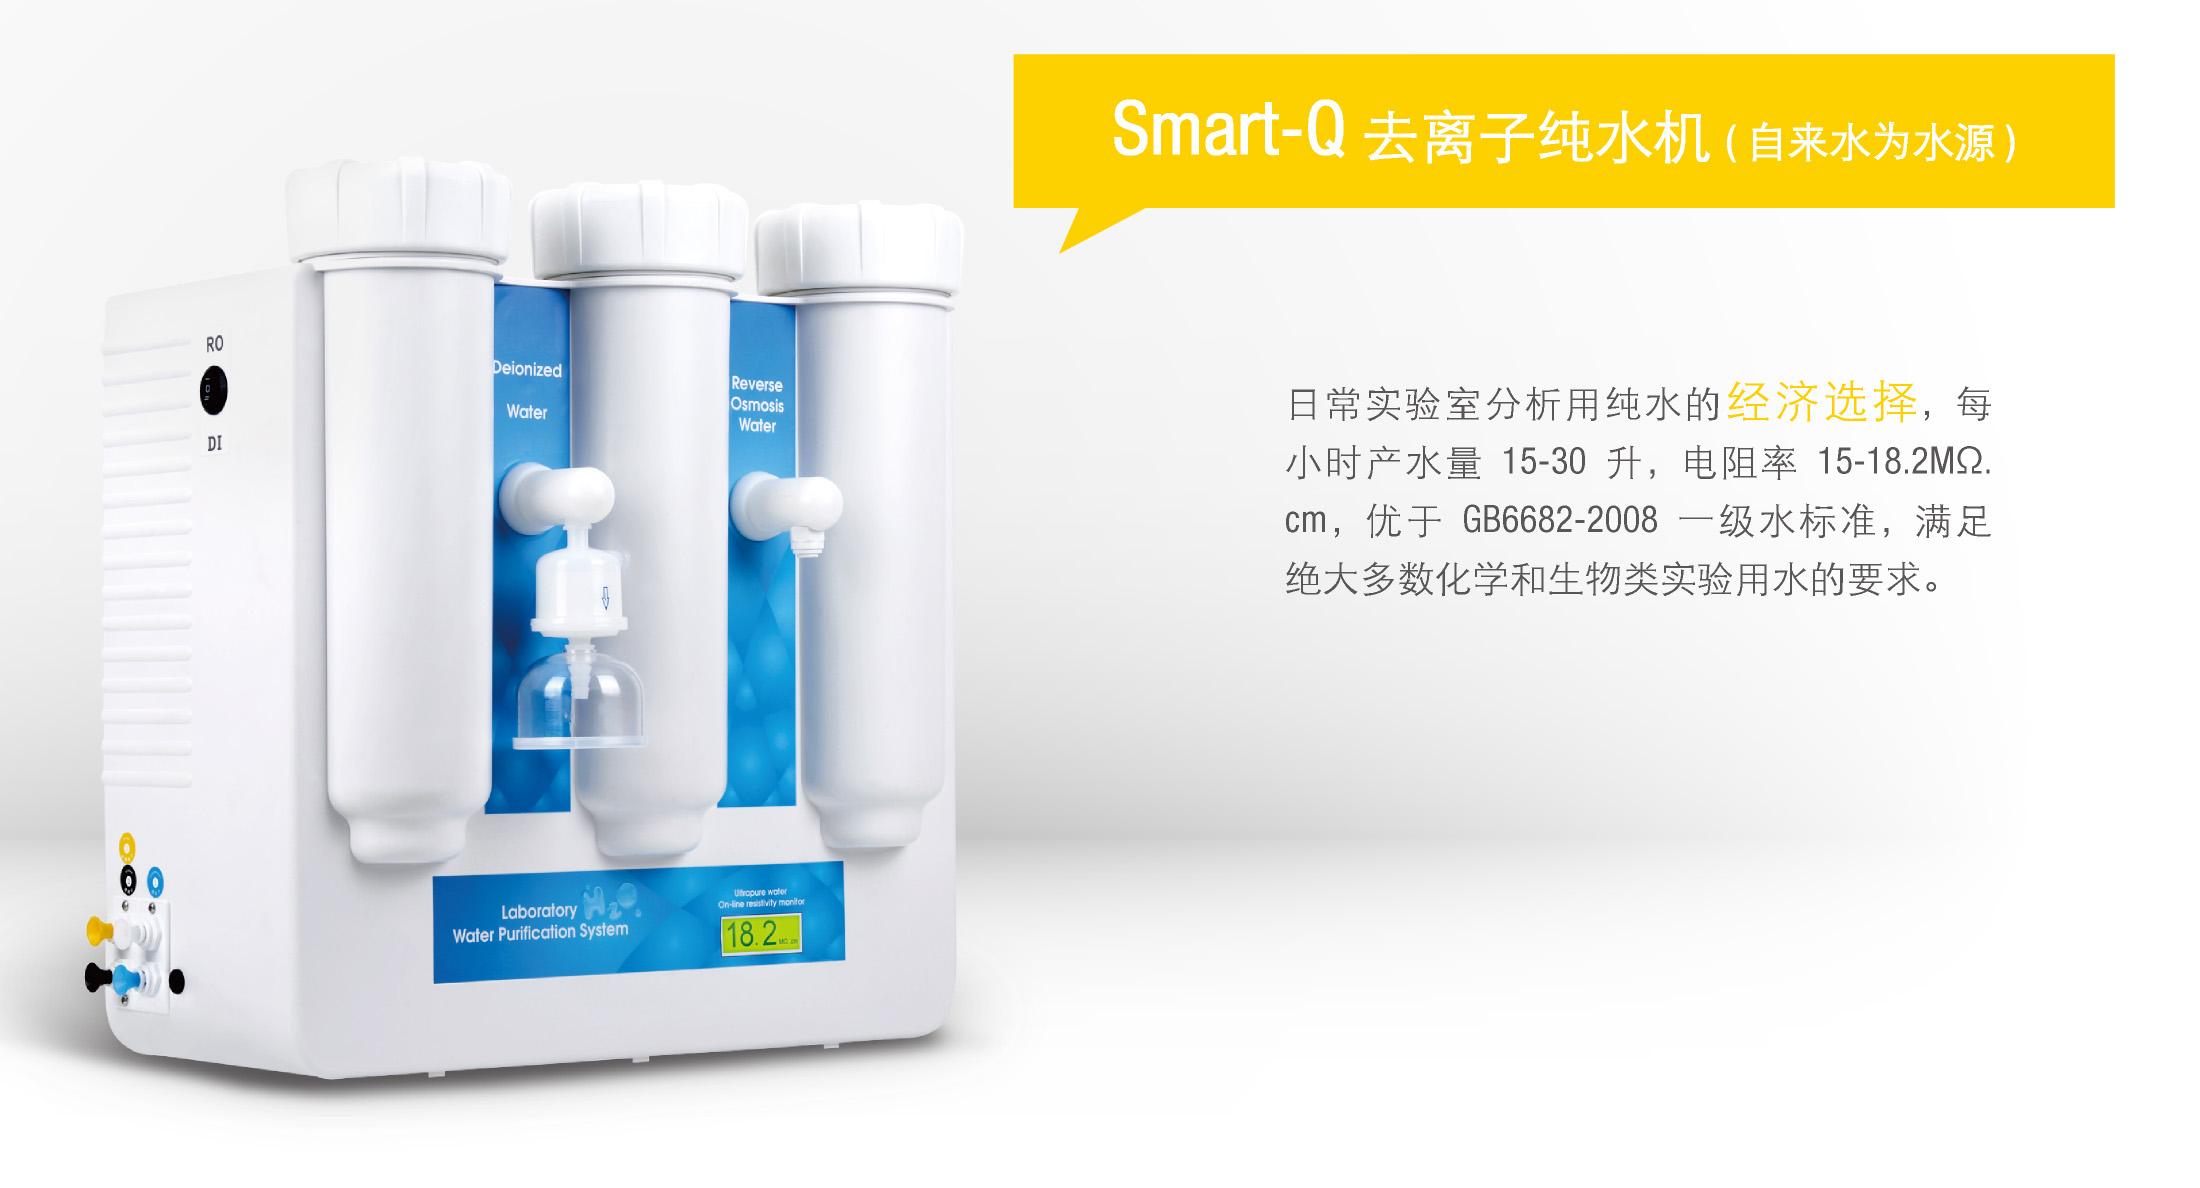 <strong>Smart-Q15/Smart-Q15UT纯水机报价</strong>